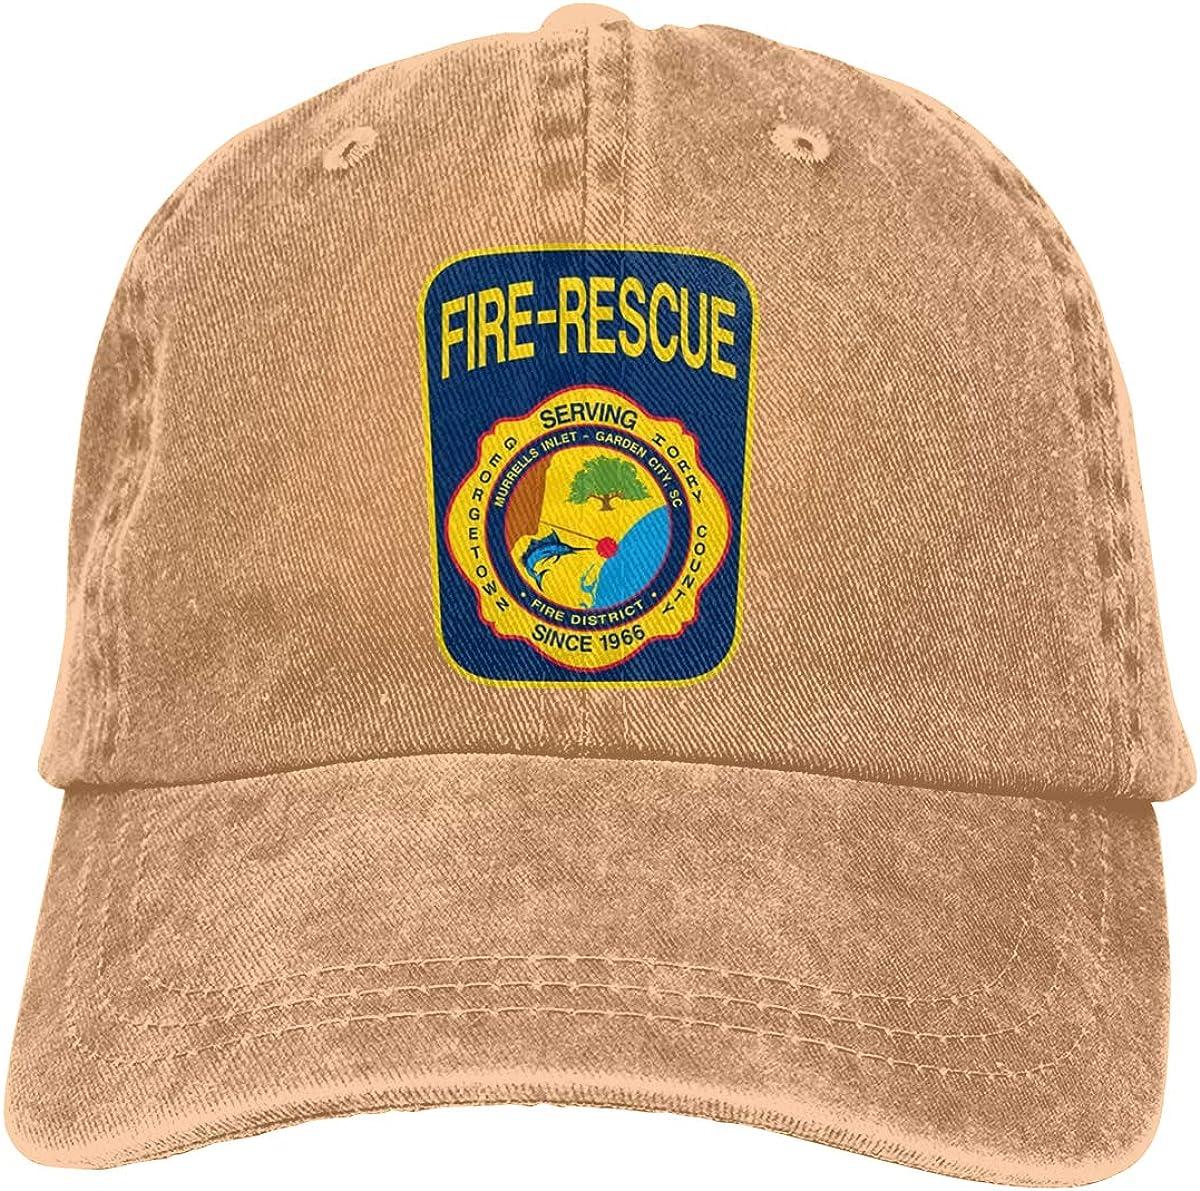 GAOFEIhat Murrells Inlet Garden City Fire District Unisex Adult Denim Hats Cowboy Hat Dad Hat Driver Cap